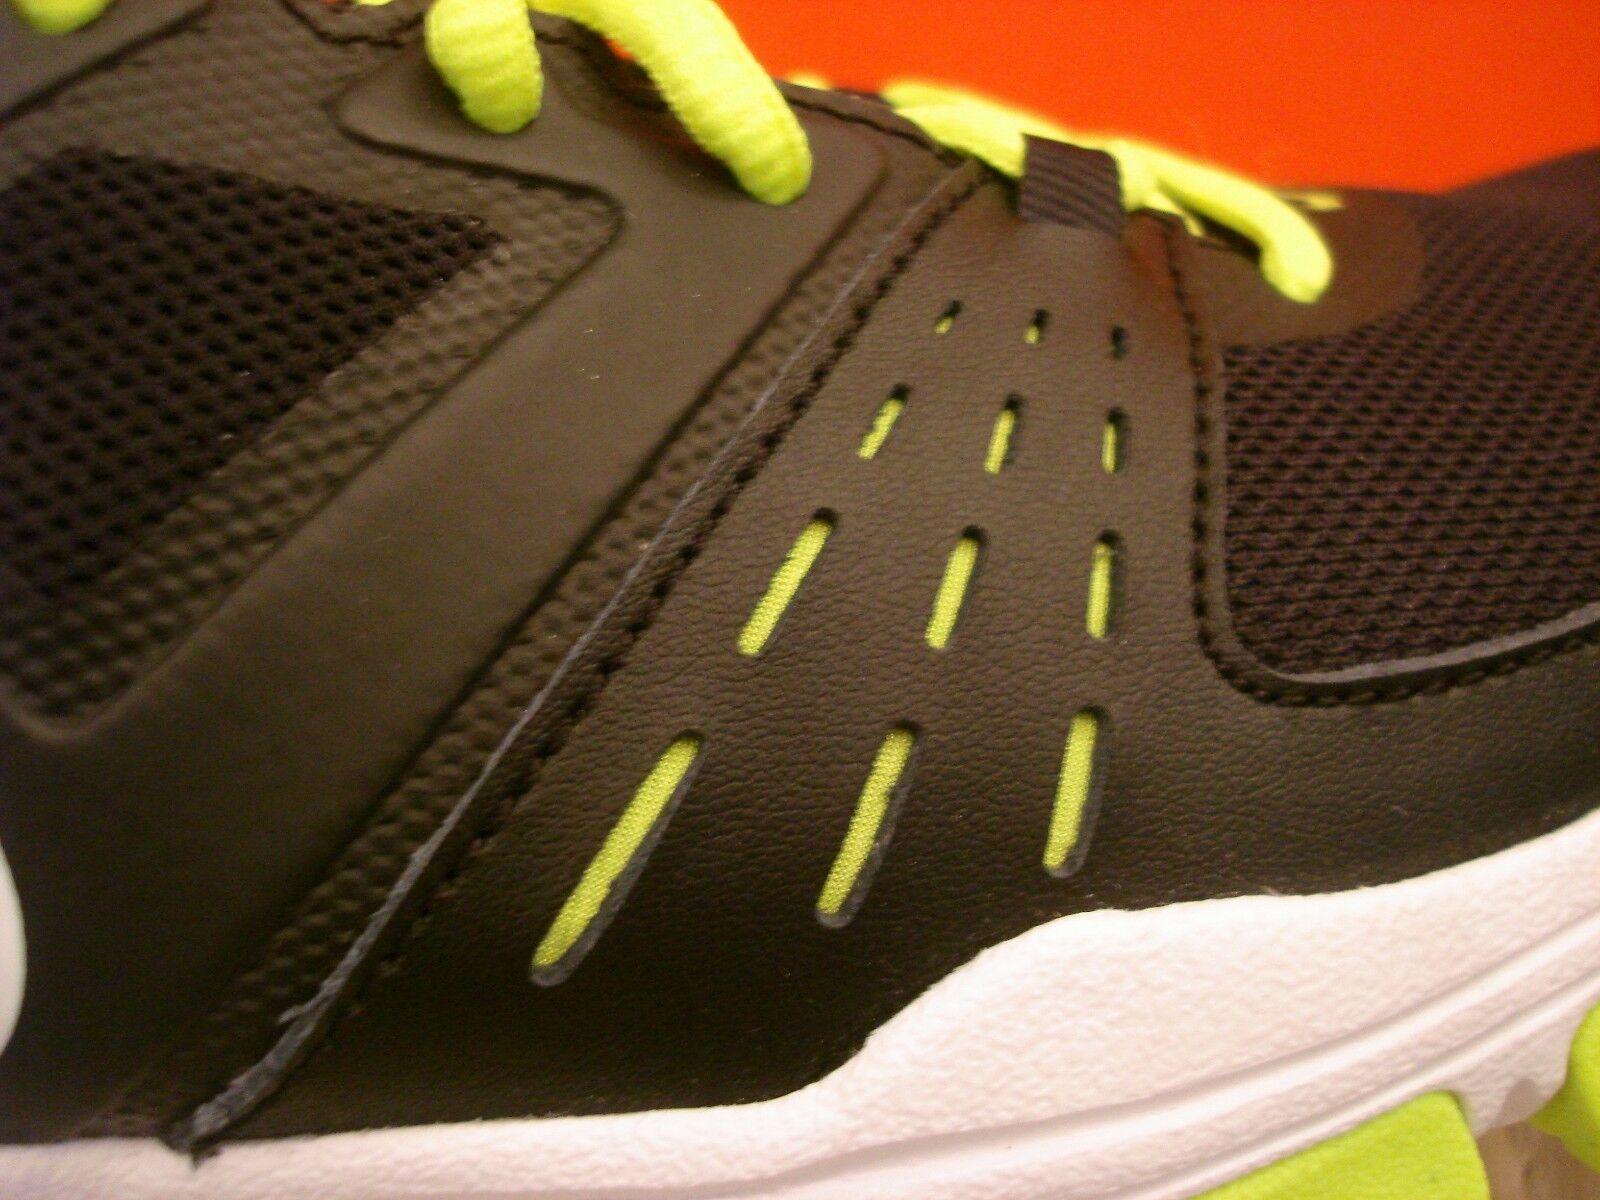 NEW WB MEN'S NIKE AIRONE ATHLETIC TENNIS TENNIS TENNIS SHOE BLACK WHITE VOLT 631276  8,8.5,10 f60116